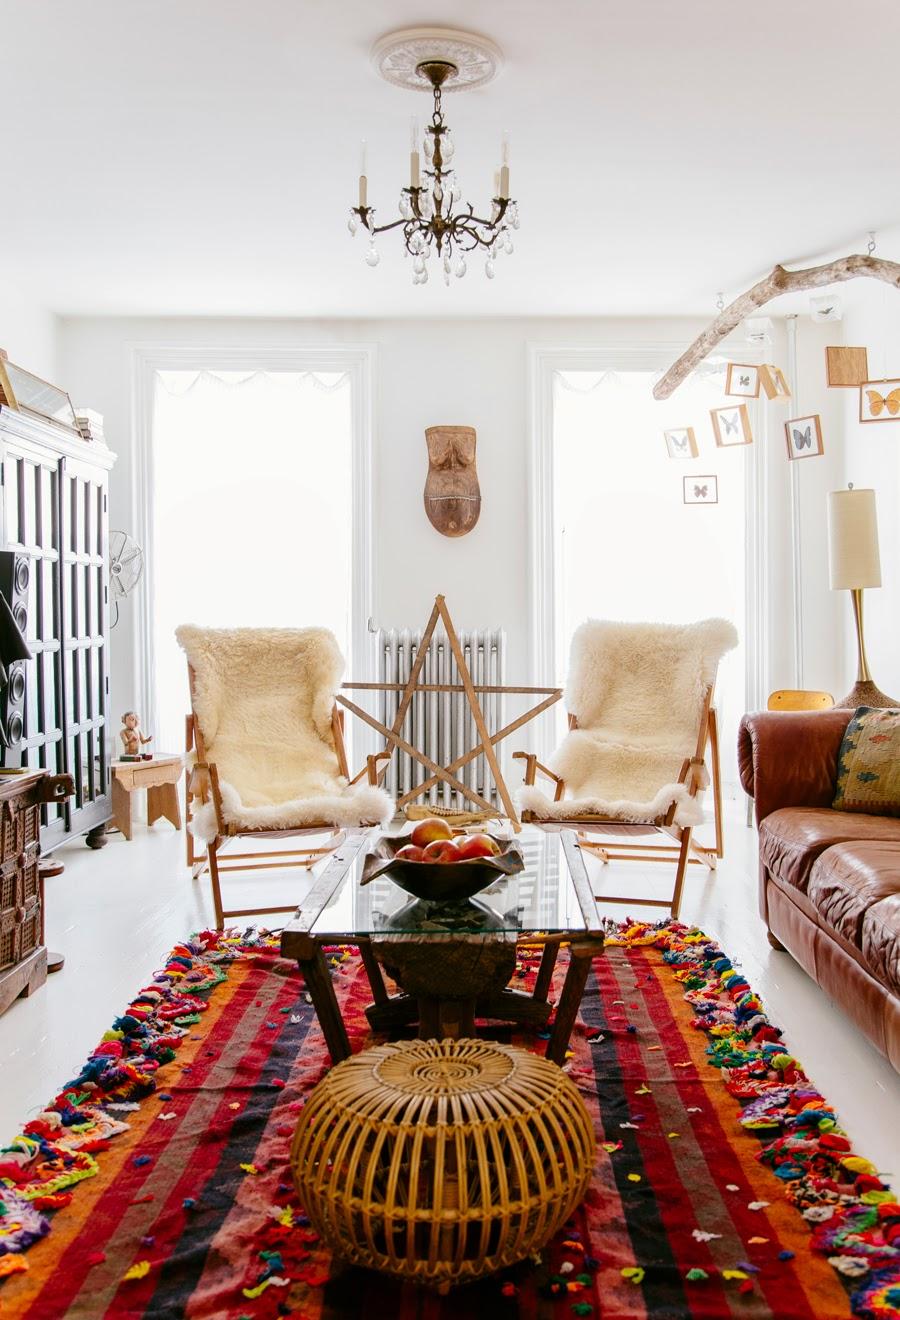 Inspiration: bohemian interiors - Seaofgirasoles